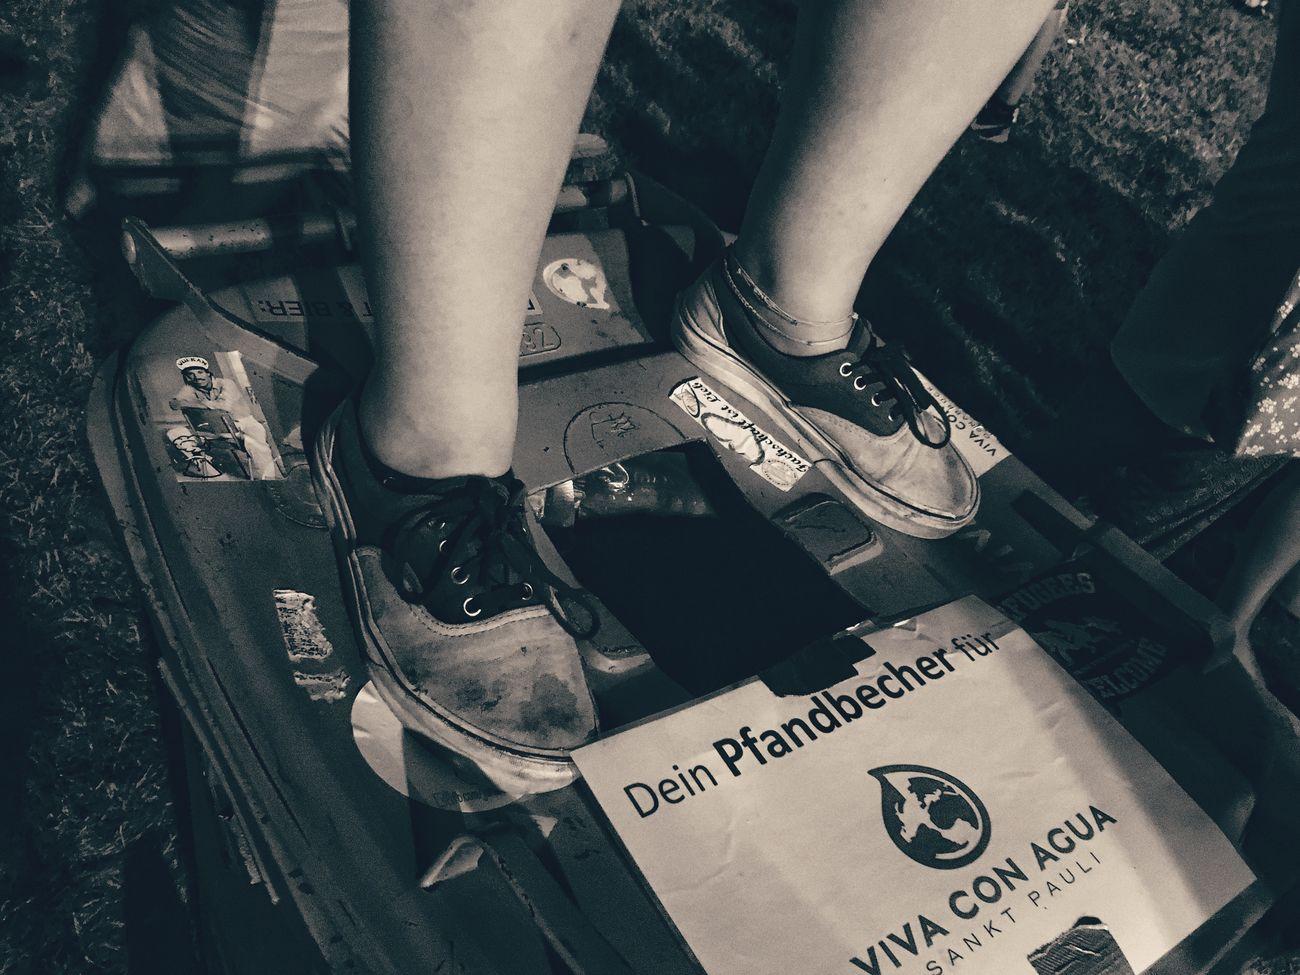 Da steht wer auf Viva Con Agua Vca Vivaconagua Festival Season Hütterocktfestival Blackandwhite Nightphotography Mülltonne Shoes Vans Vans Off The Wall